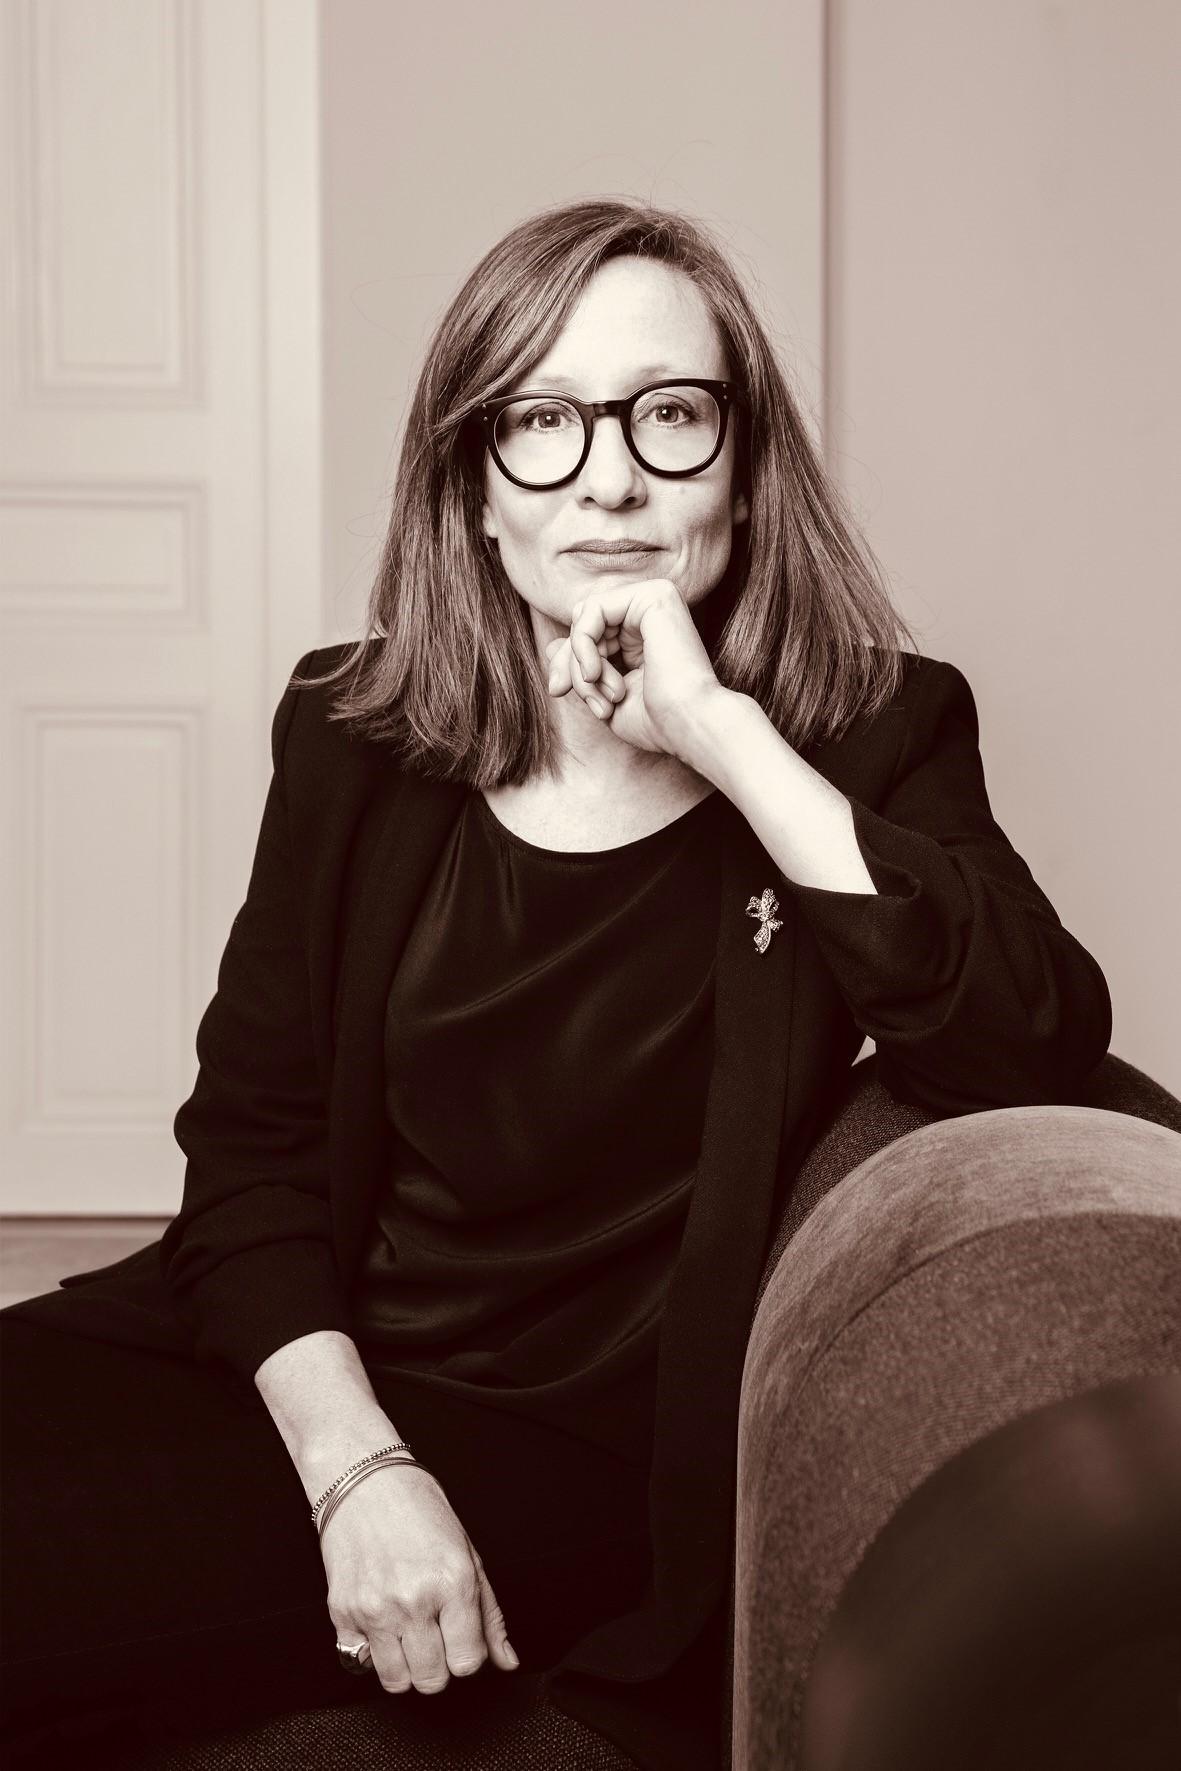 Isabelle Bühler Galladé